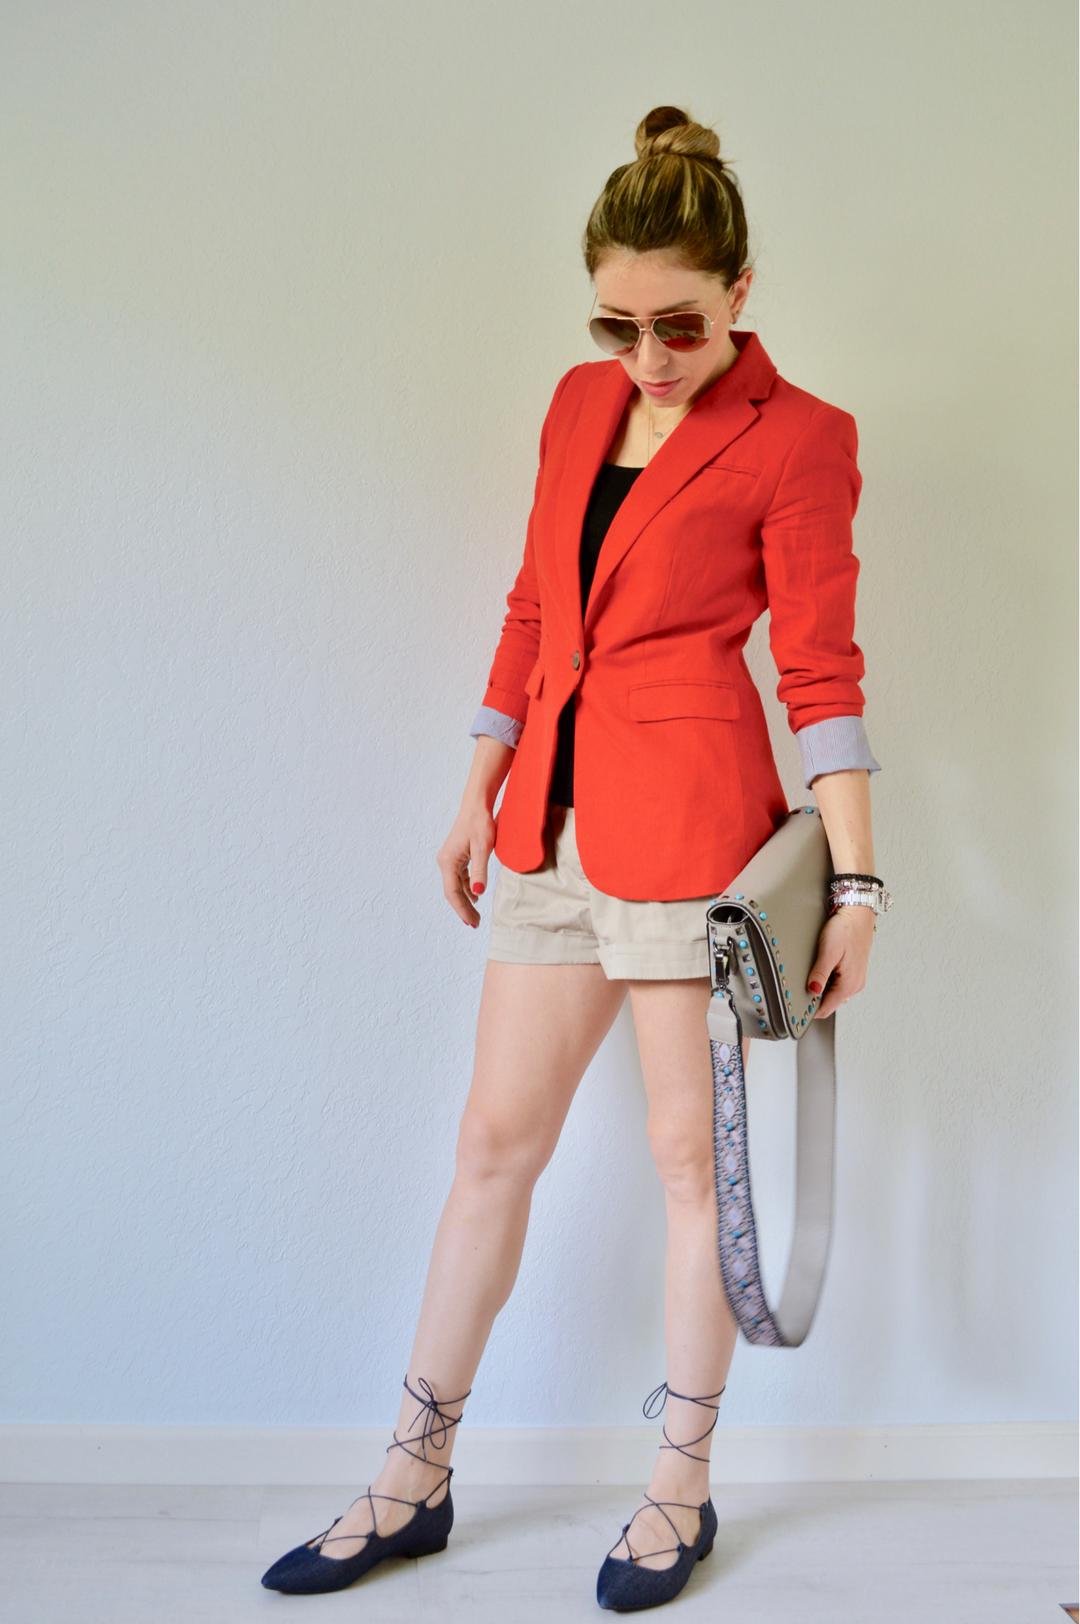 Wear to what under a red blazer new photo